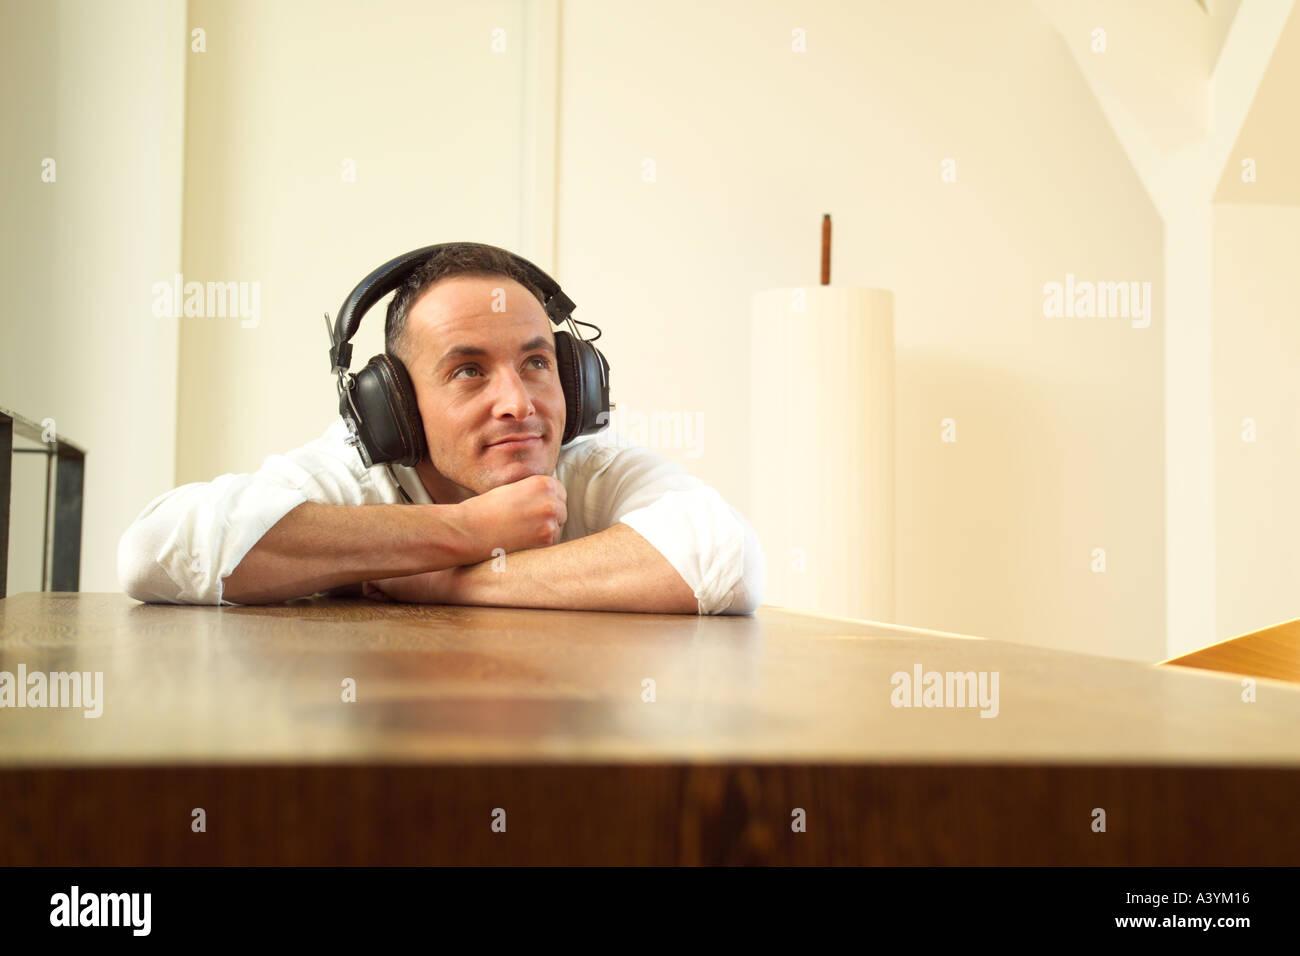 Man listening to music on headphones Photo Stock